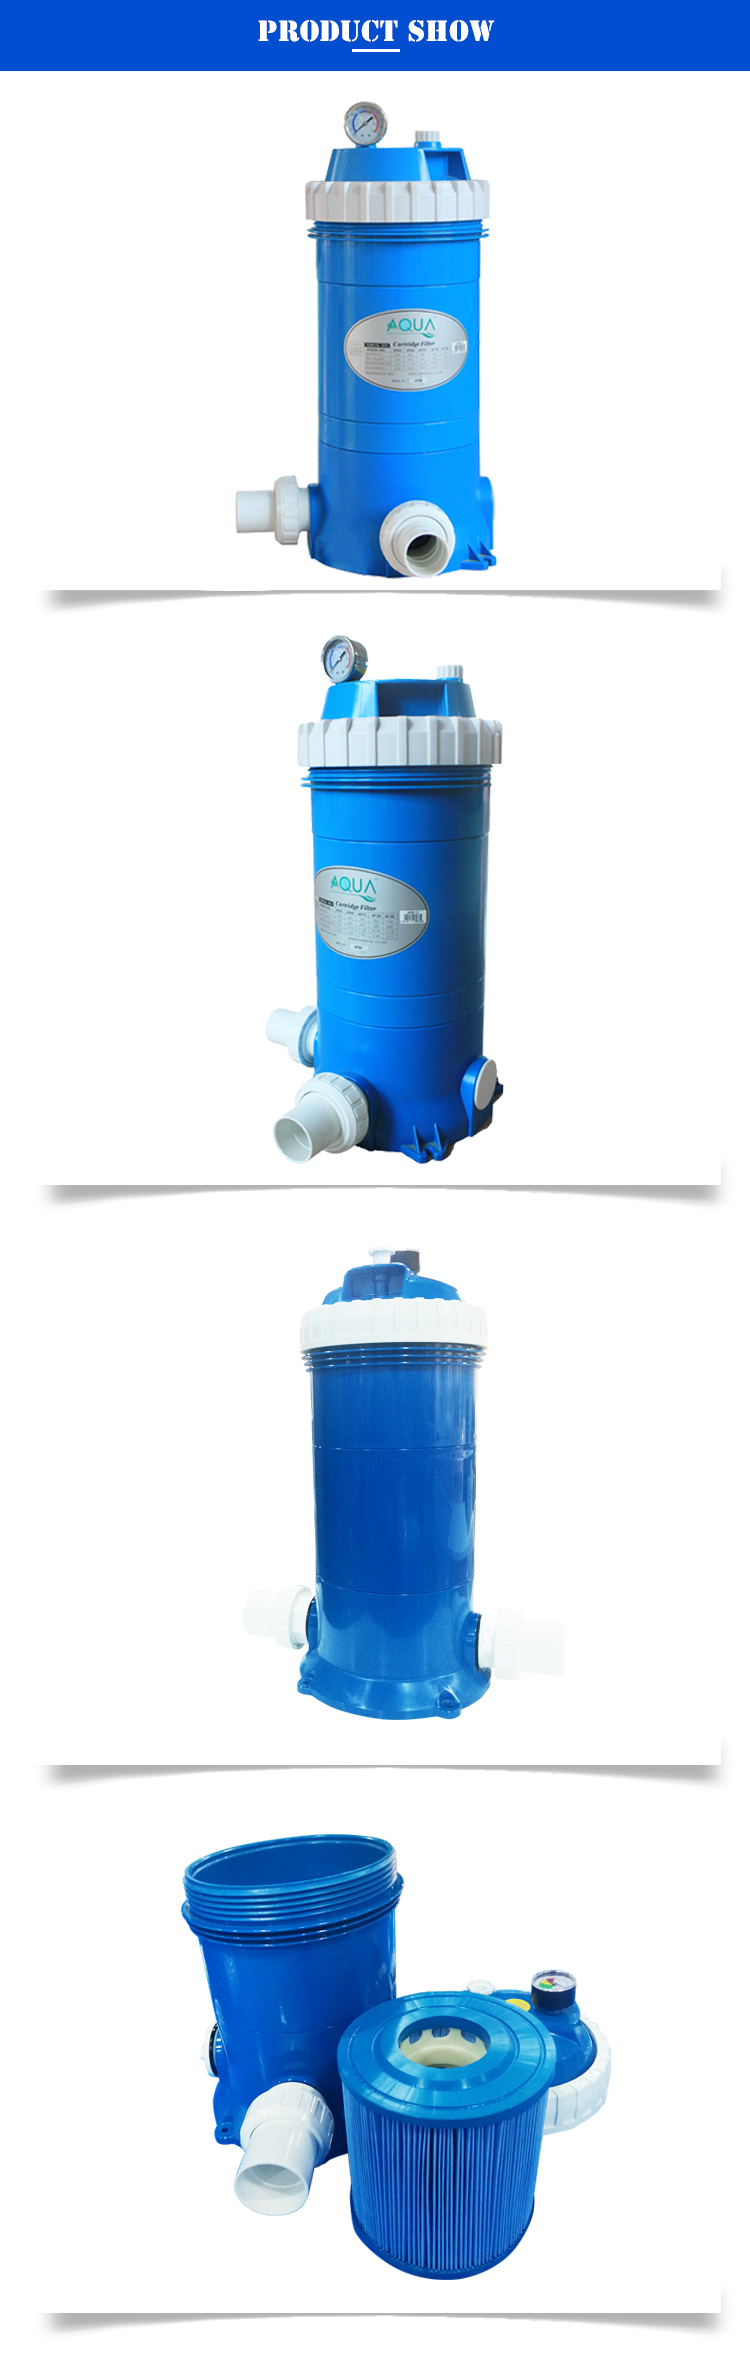 Fada da água Piscina Filtro Cartucho Plissado 85 CM 31 Polegadas